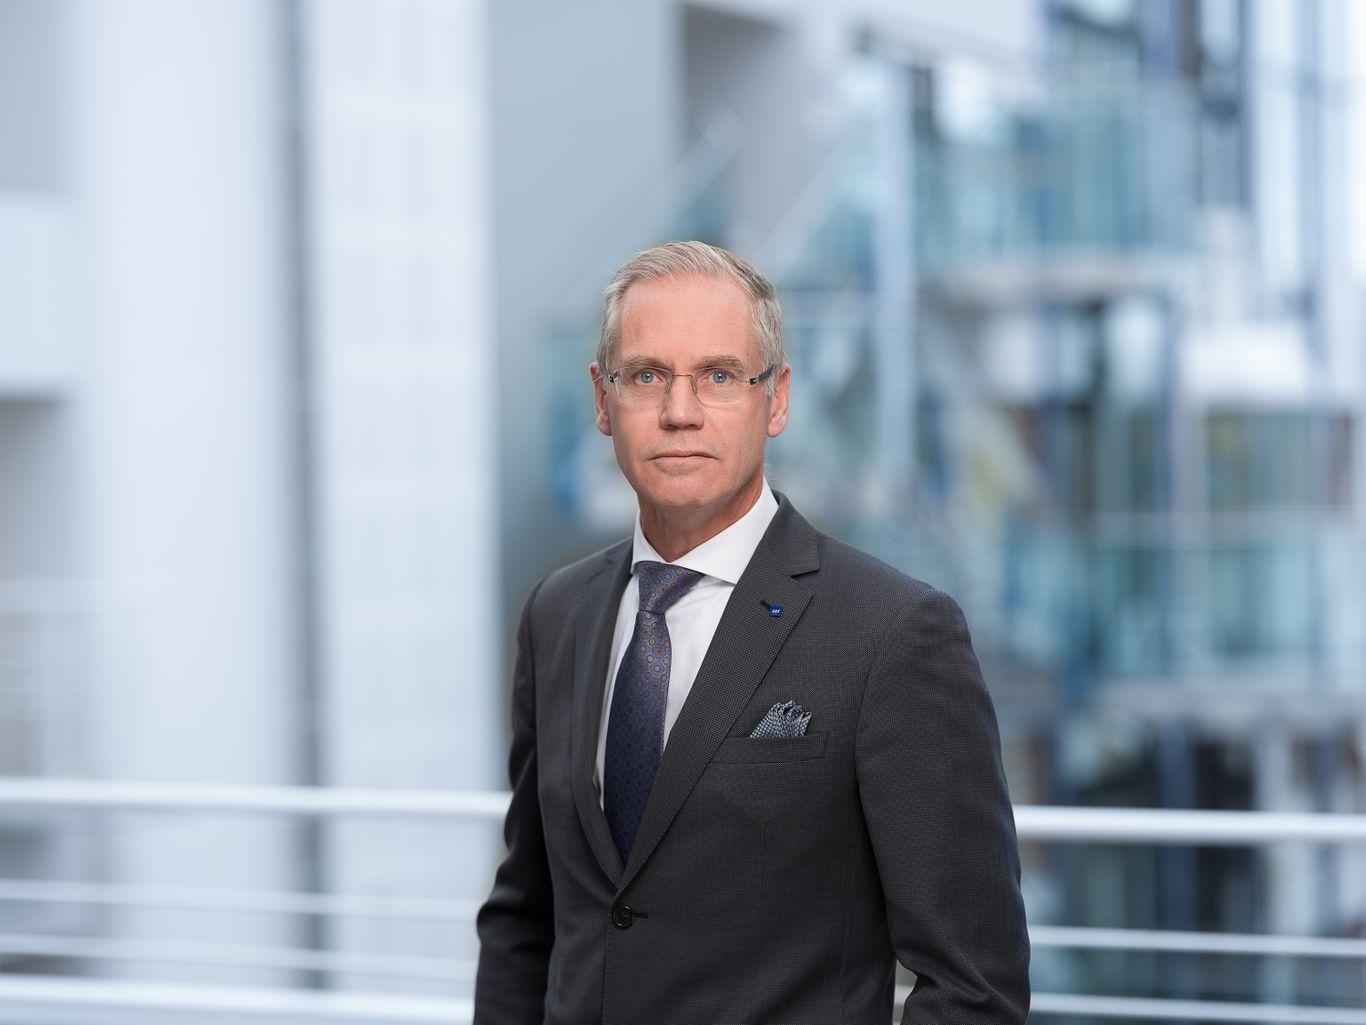 Koncernchef Rickard Gustafson fra SAS. (Foto: SAS AB)